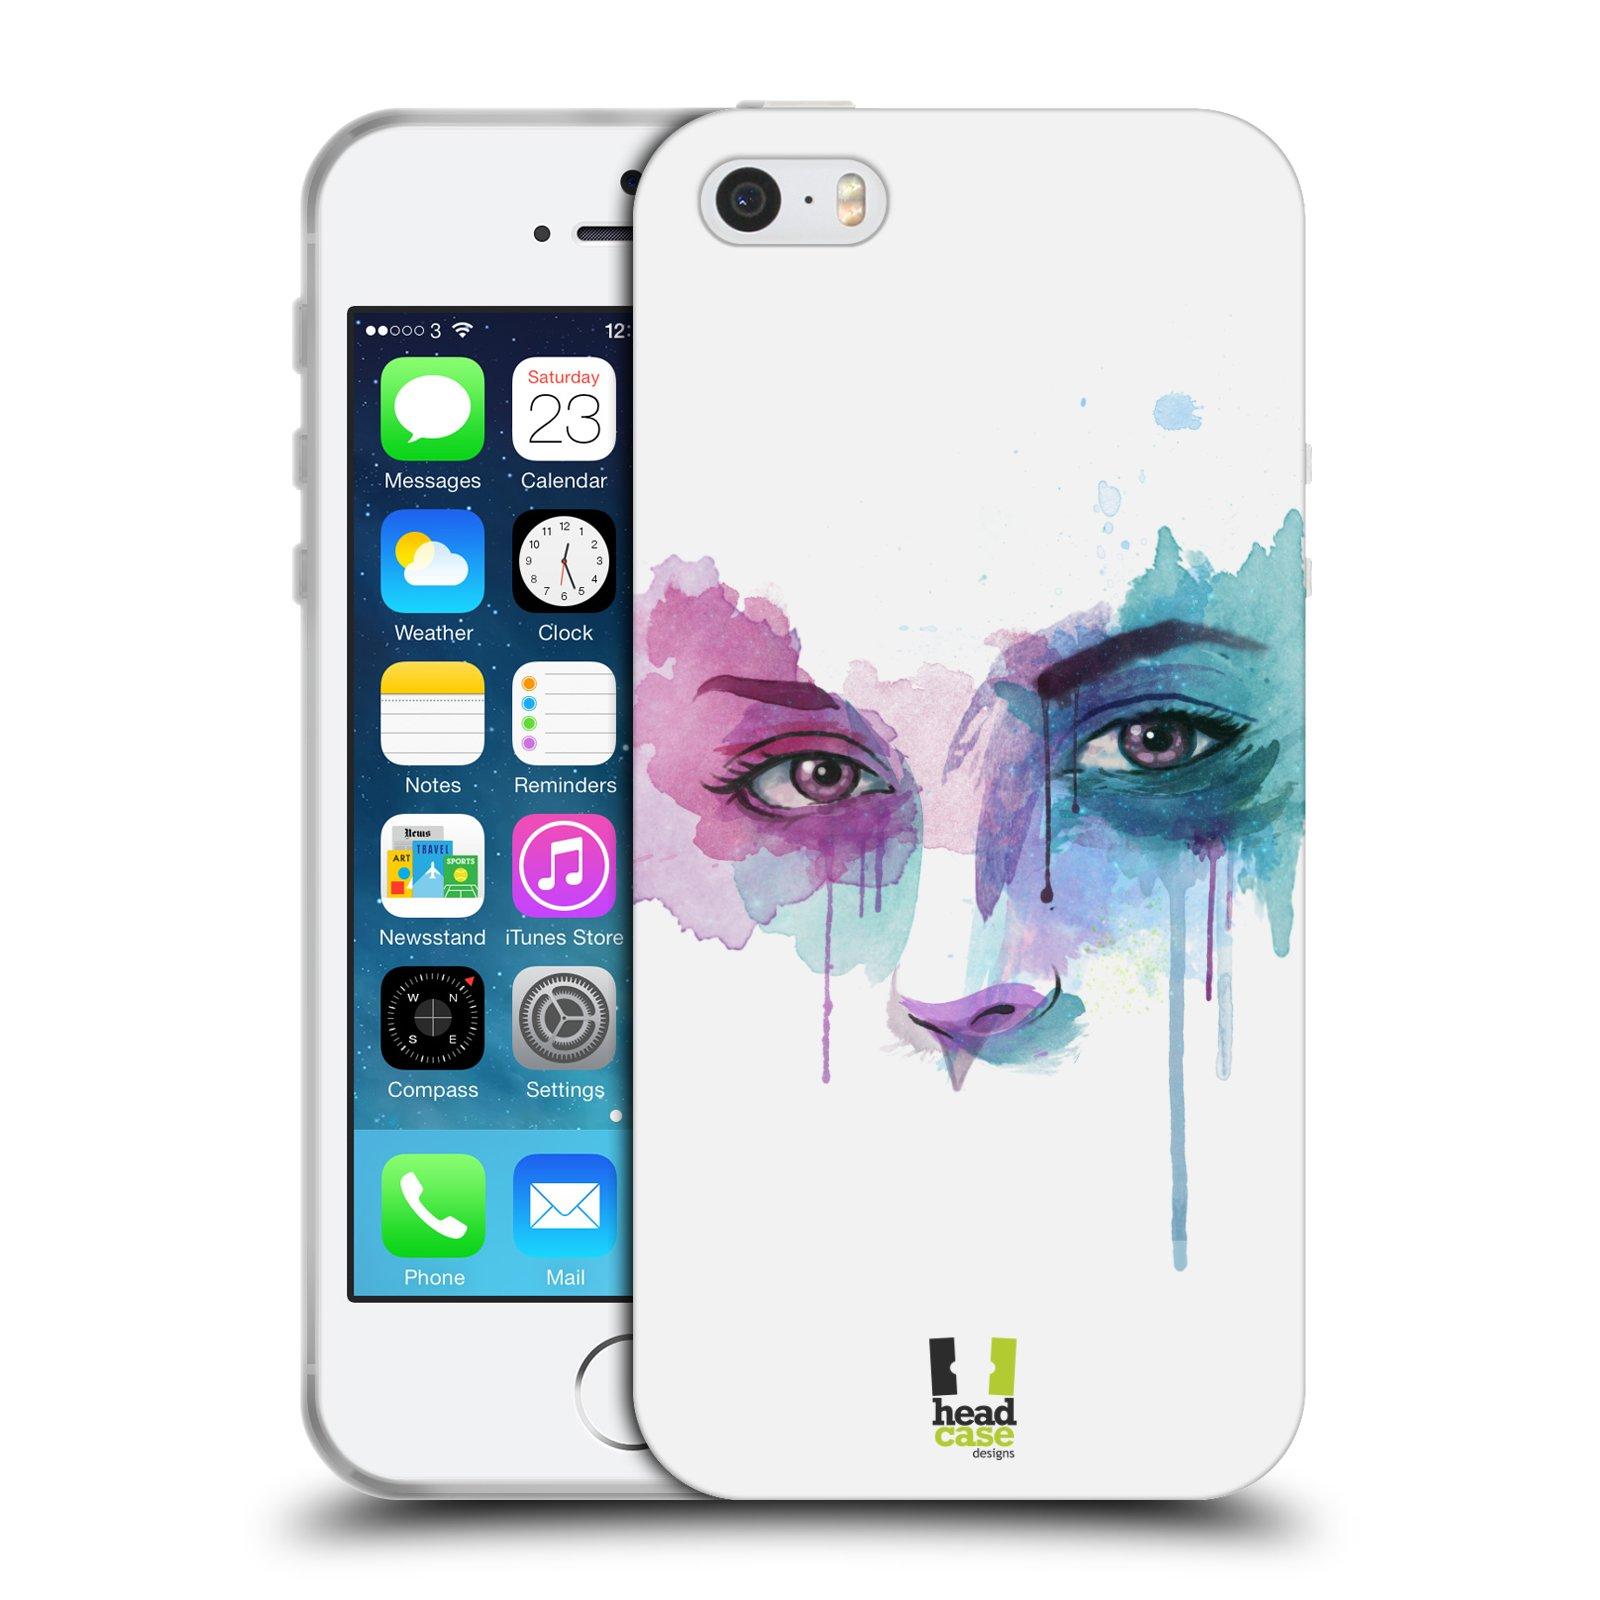 HEAD CASE silikonový obal na mobil Apple Iphone SE vzor Tvaře vodní barvy  NOVÝ POHLED 0694d3aa912